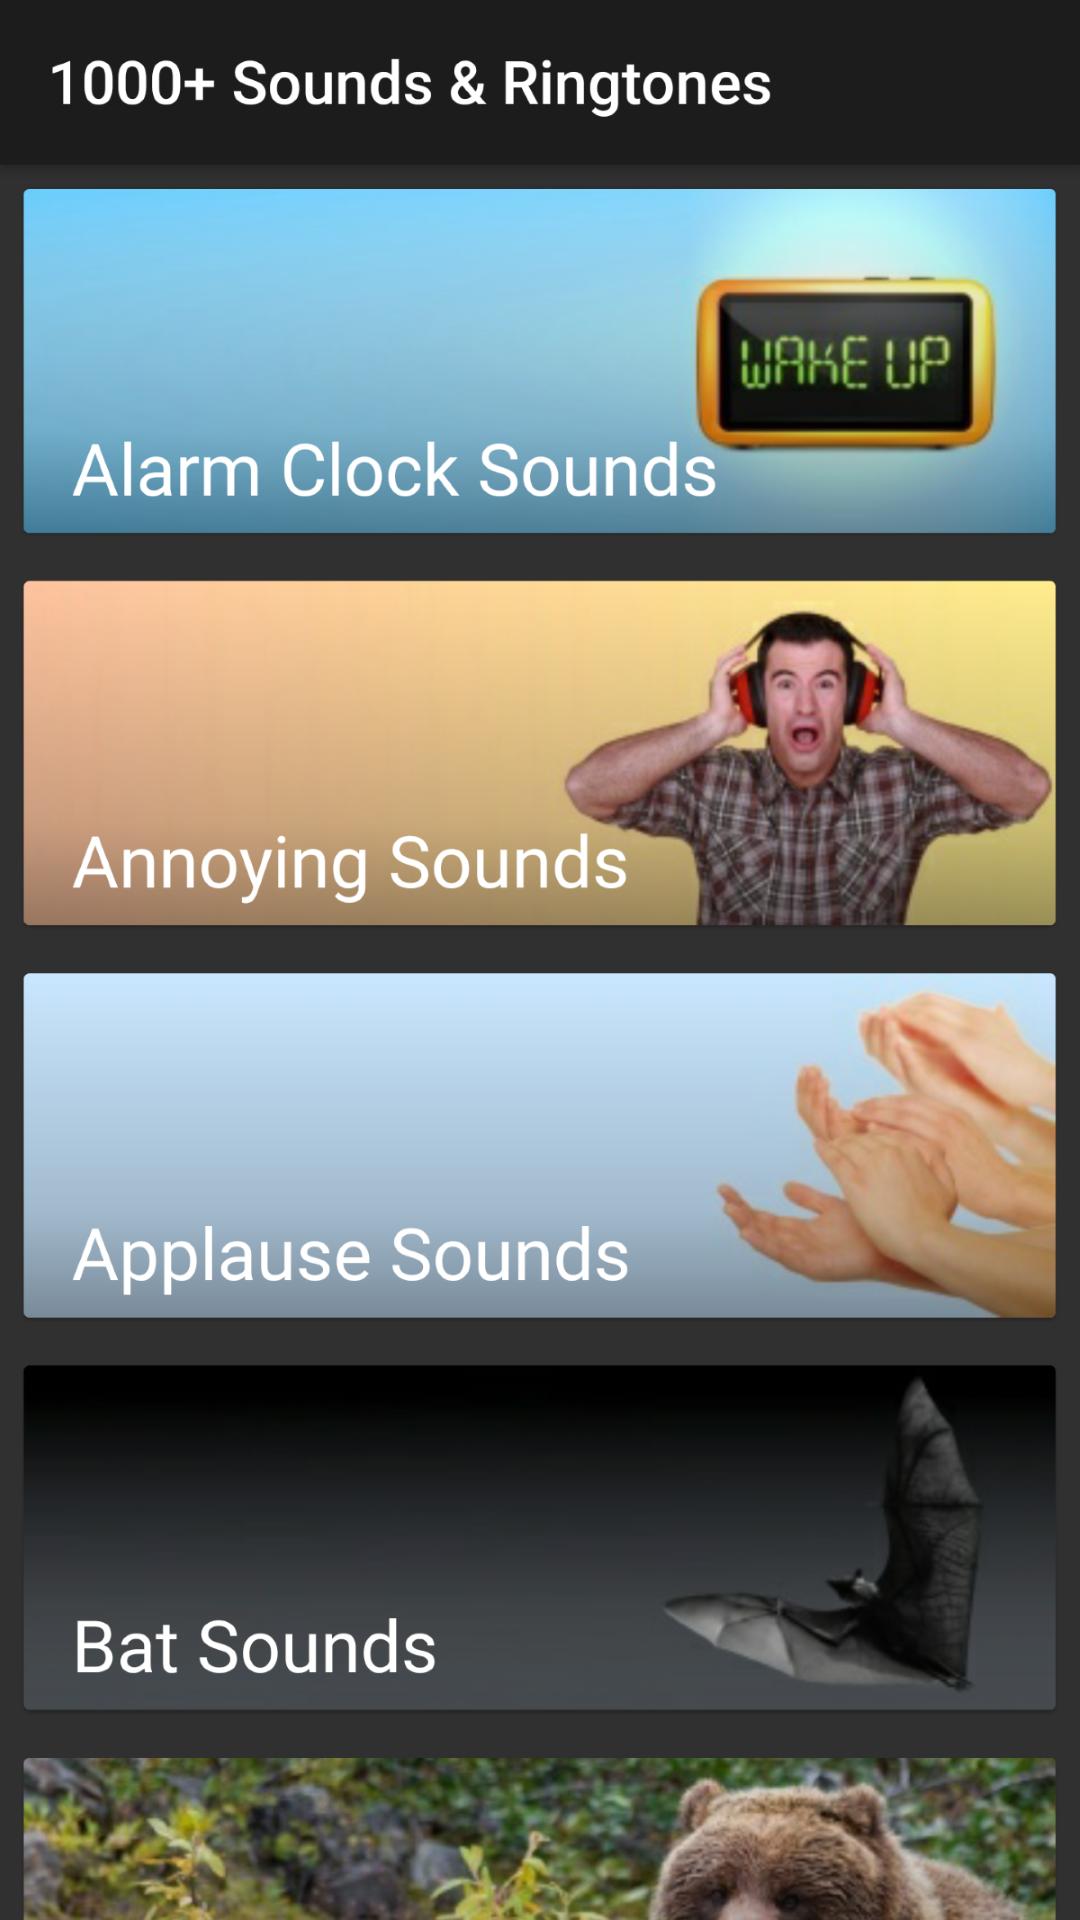 1000+ Sounds & Ringtones: Amazon.es: Appstore para Android